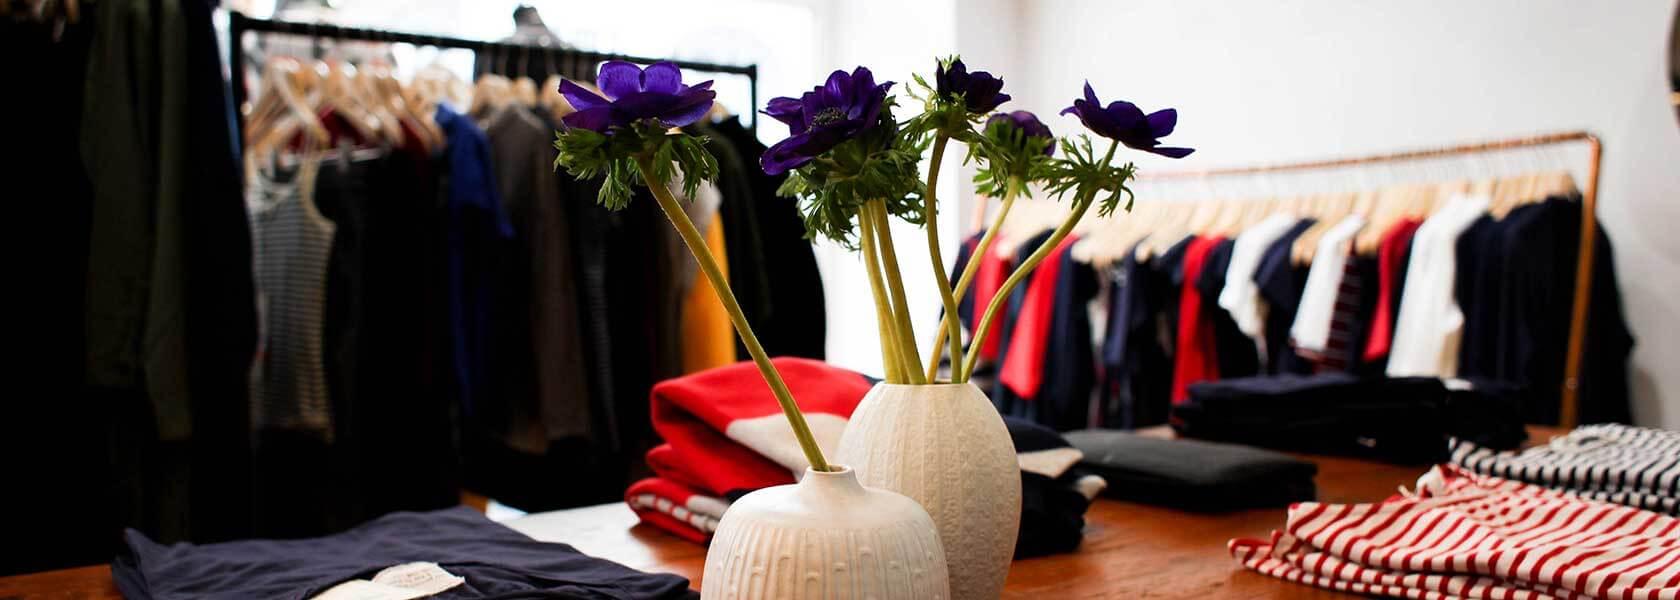 Fair Fashion in Berlin bei Loveco shoppen